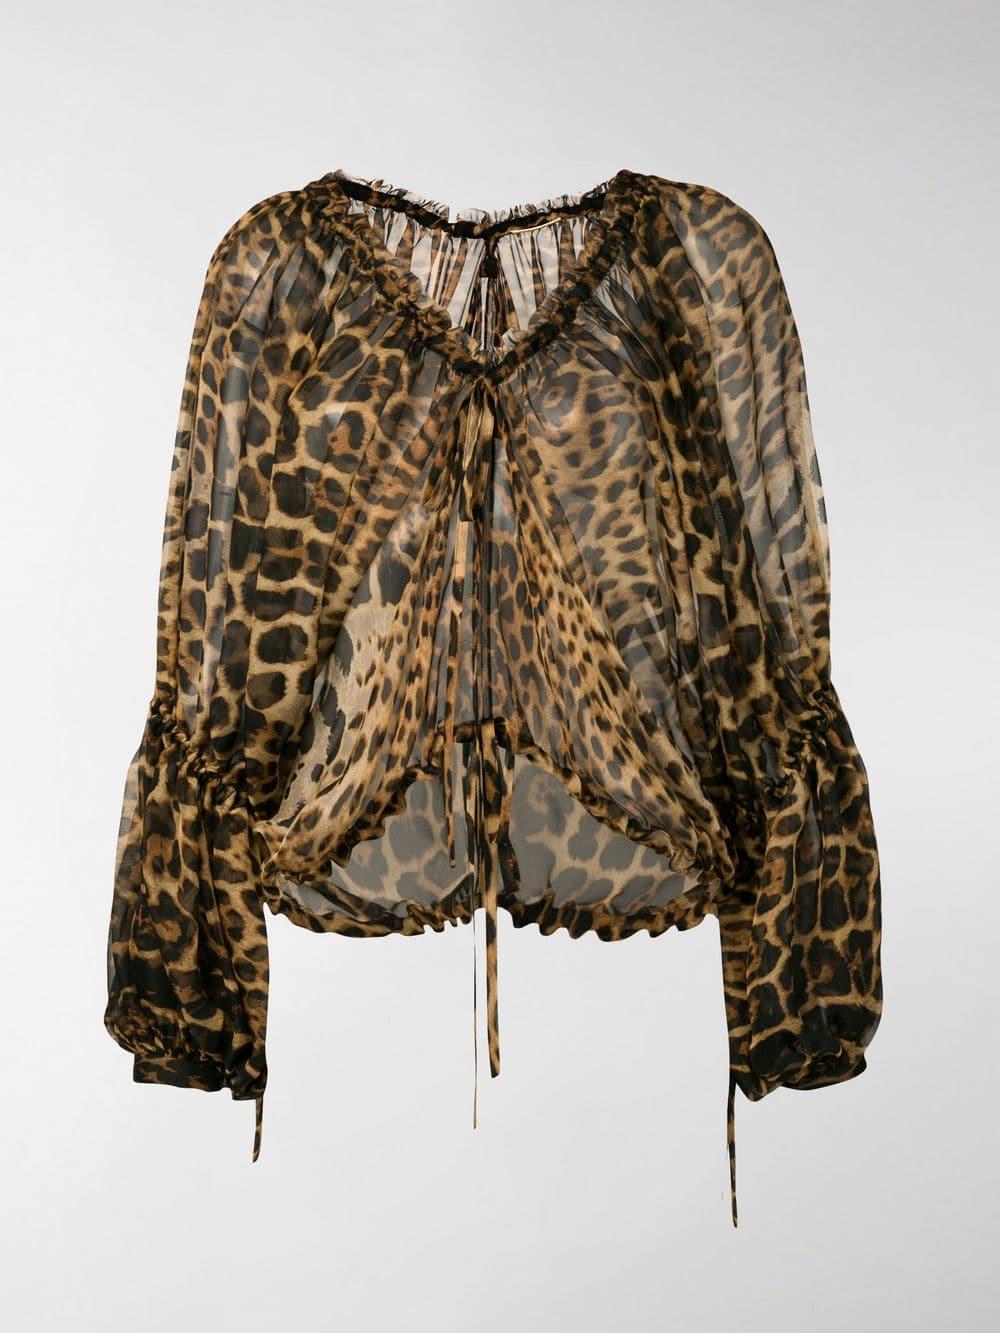 7dc691ed Lyst - Saint Laurent Sheer Leopard Print Blouse in Brown